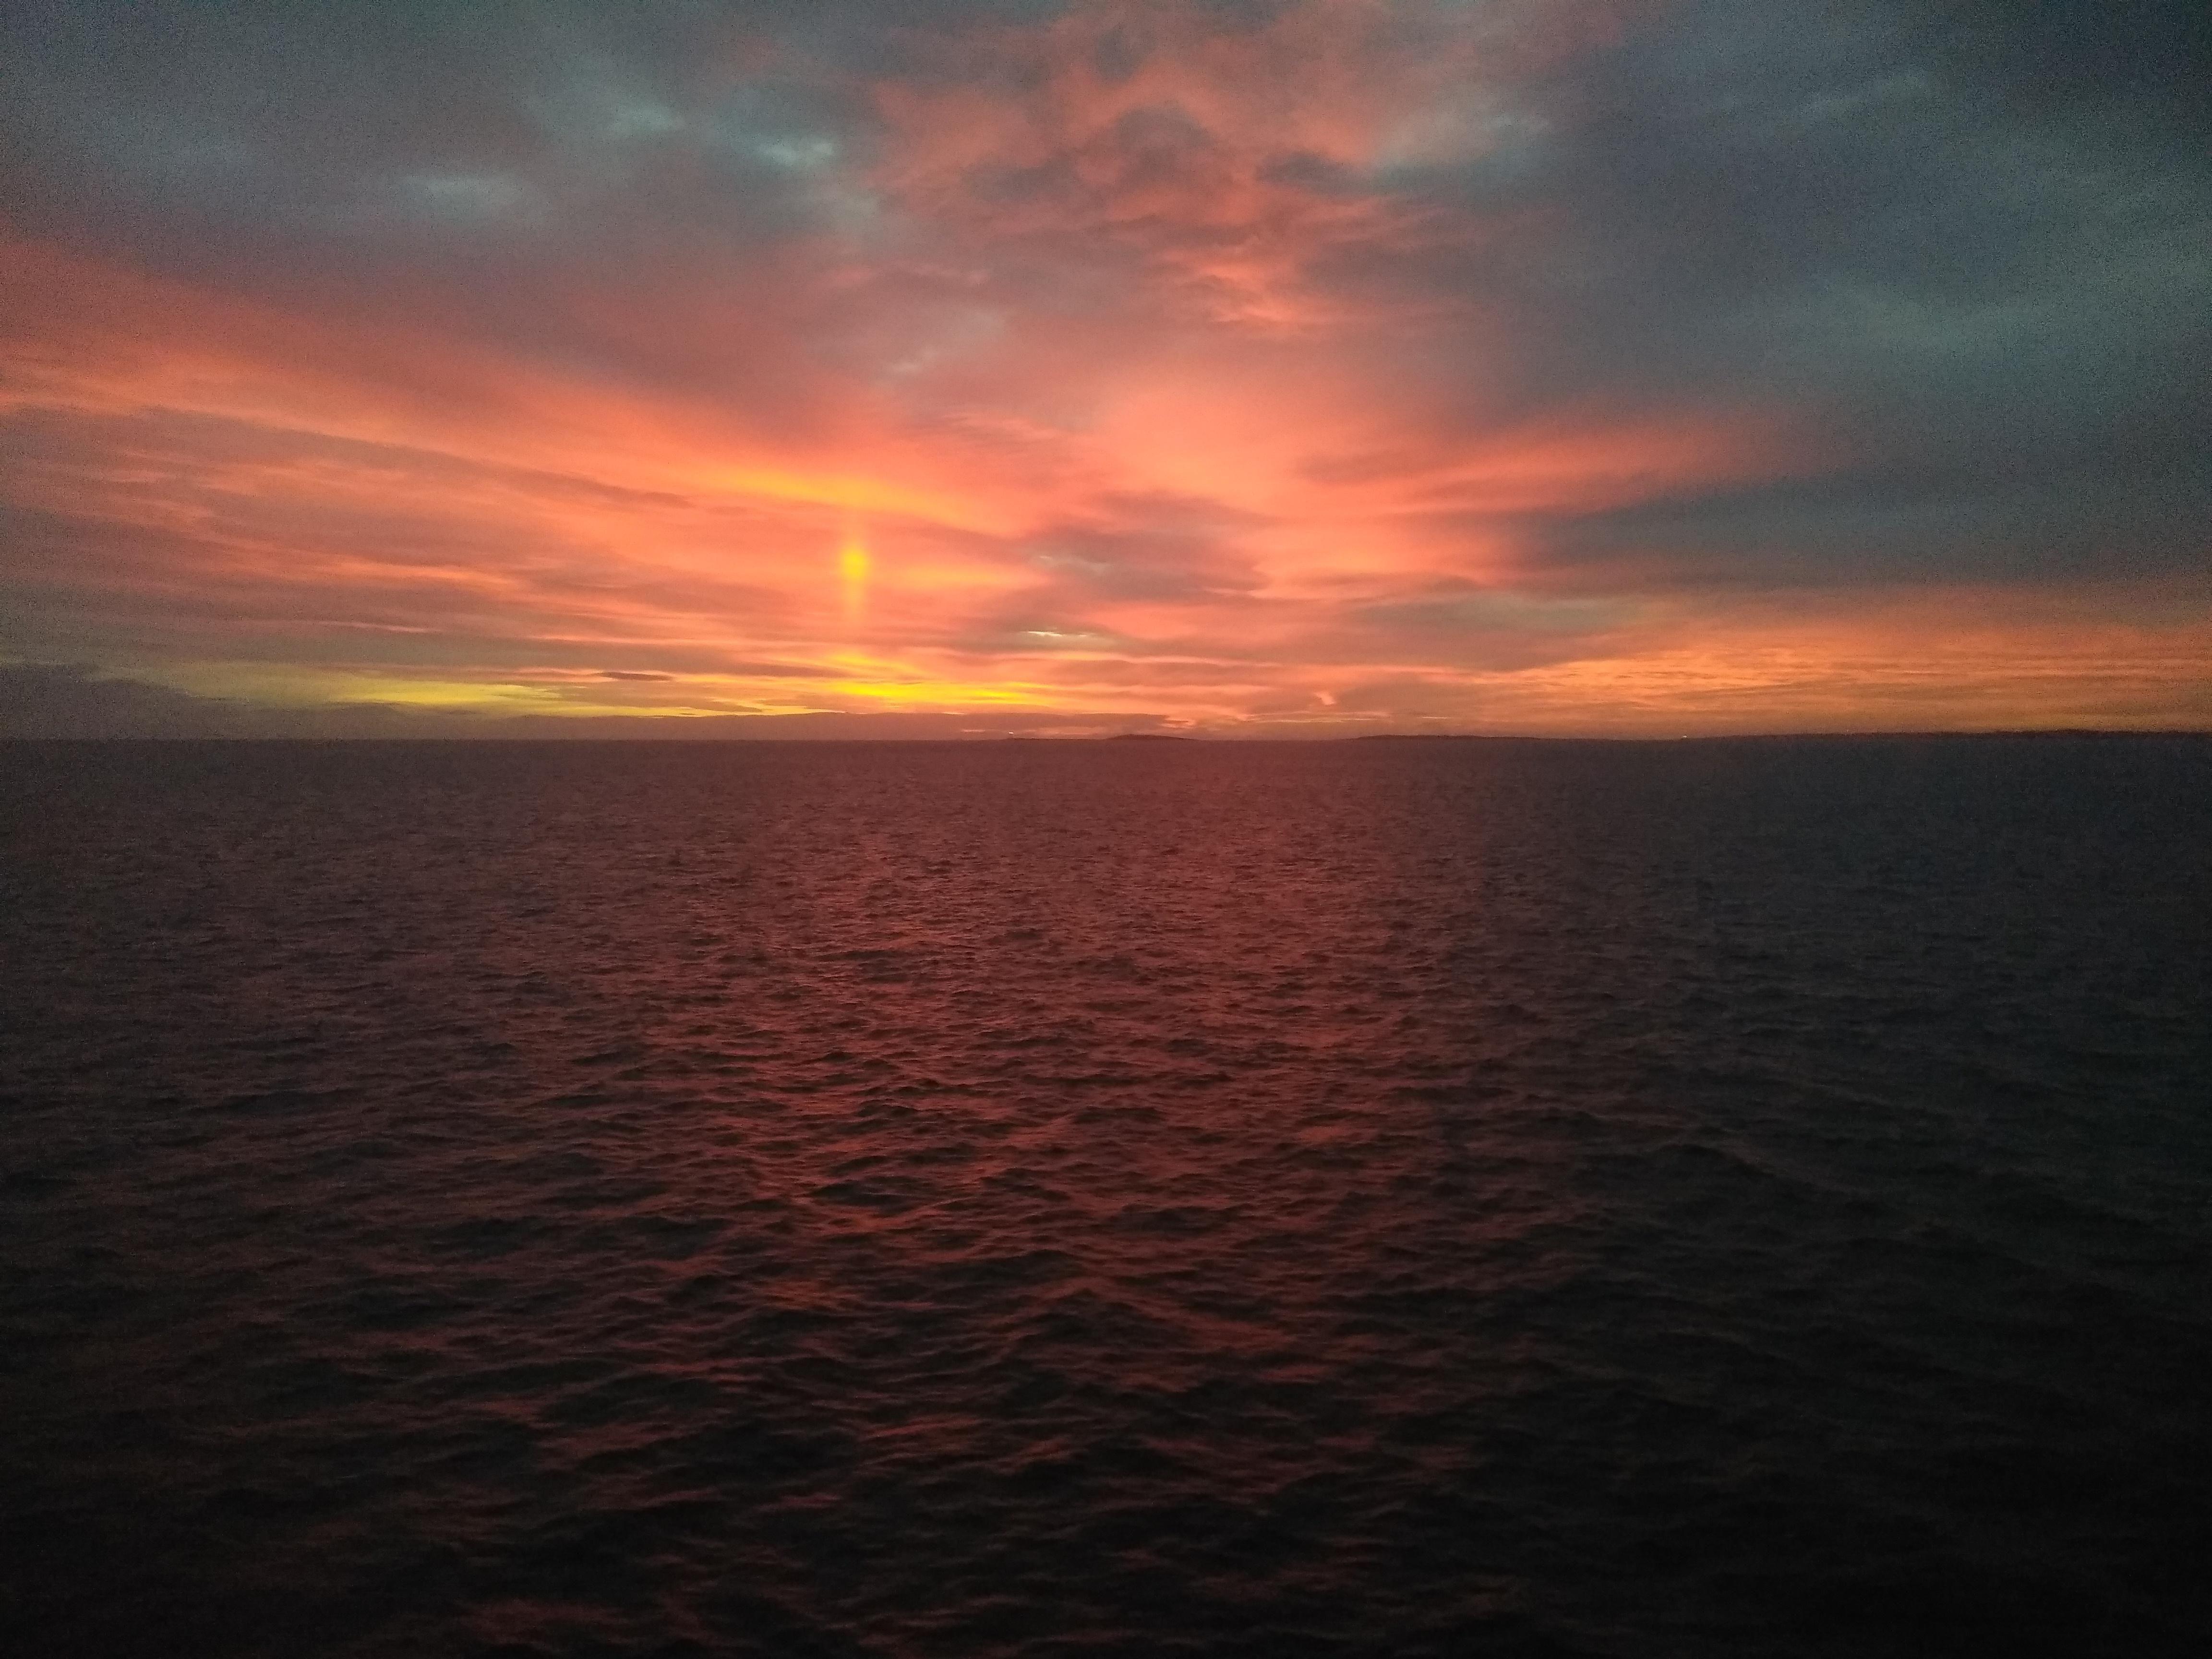 Sunrise over the Irish Sea complete with sun-sprite! [OC] [4608x3456] #irishsea Sunrise over the Irish Sea complete with sun-sprite! [OC] [4608x3456] #irishsea Sunrise over the Irish Sea complete with sun-sprite! [OC] [4608x3456] #irishsea Sunrise over the Irish Sea complete with sun-sprite! [OC] [4608x3456] #irishsea Sunrise over the Irish Sea complete with sun-sprite! [OC] [4608x3456] #irishsea Sunrise over the Irish Sea complete with sun-sprite! [OC] [4608x3456] #irishsea Sunrise over the Iri #irishsea